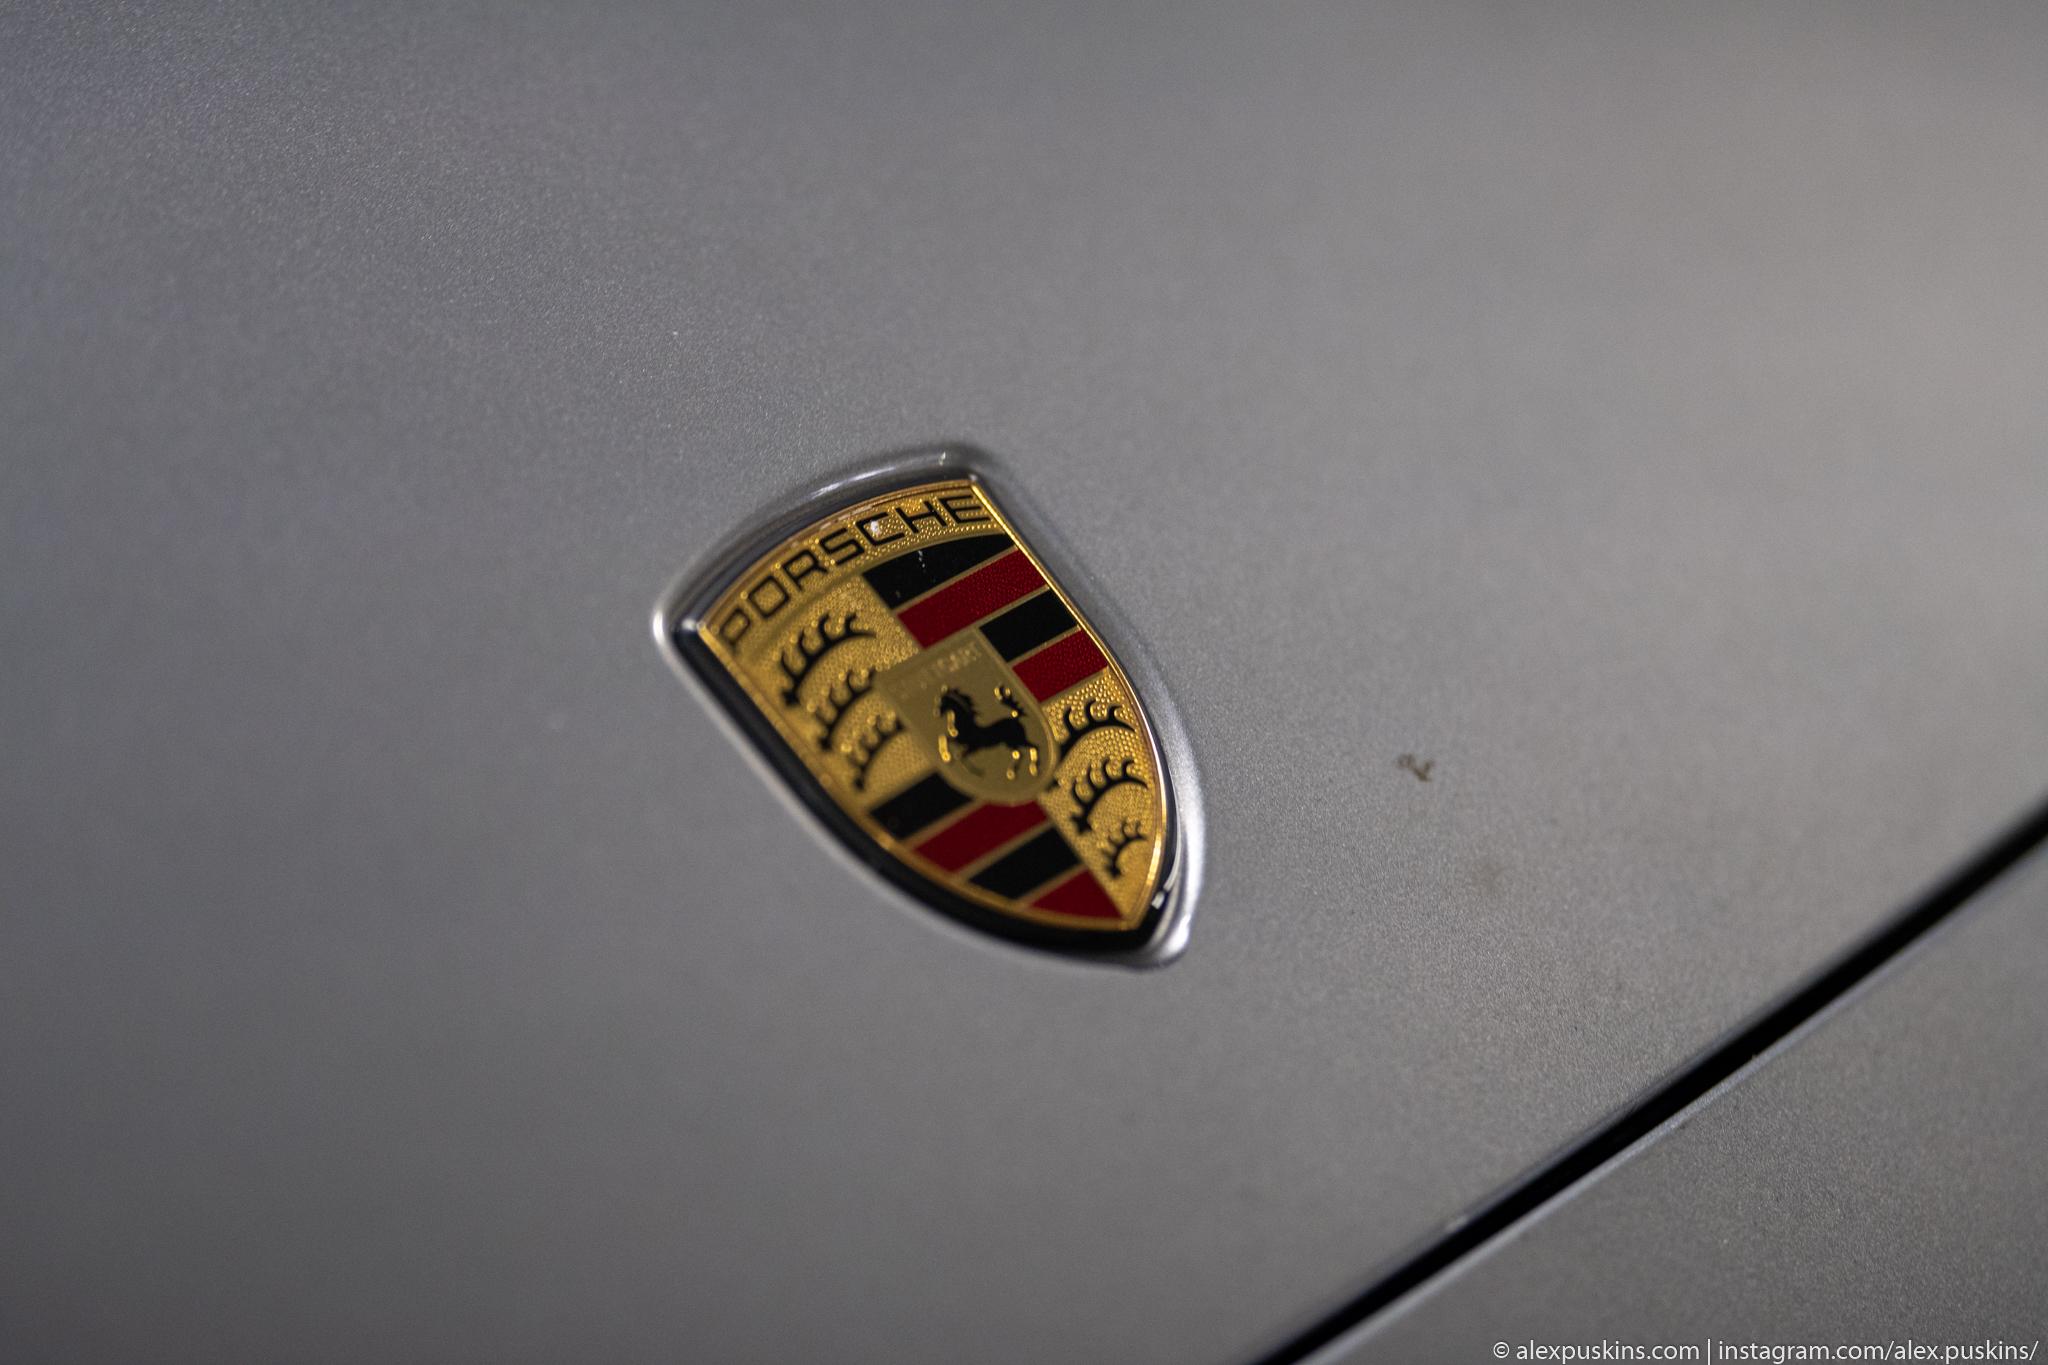 Познавательные новости про Audi и Peugeot на веб-ресурсе Autobrands.lv